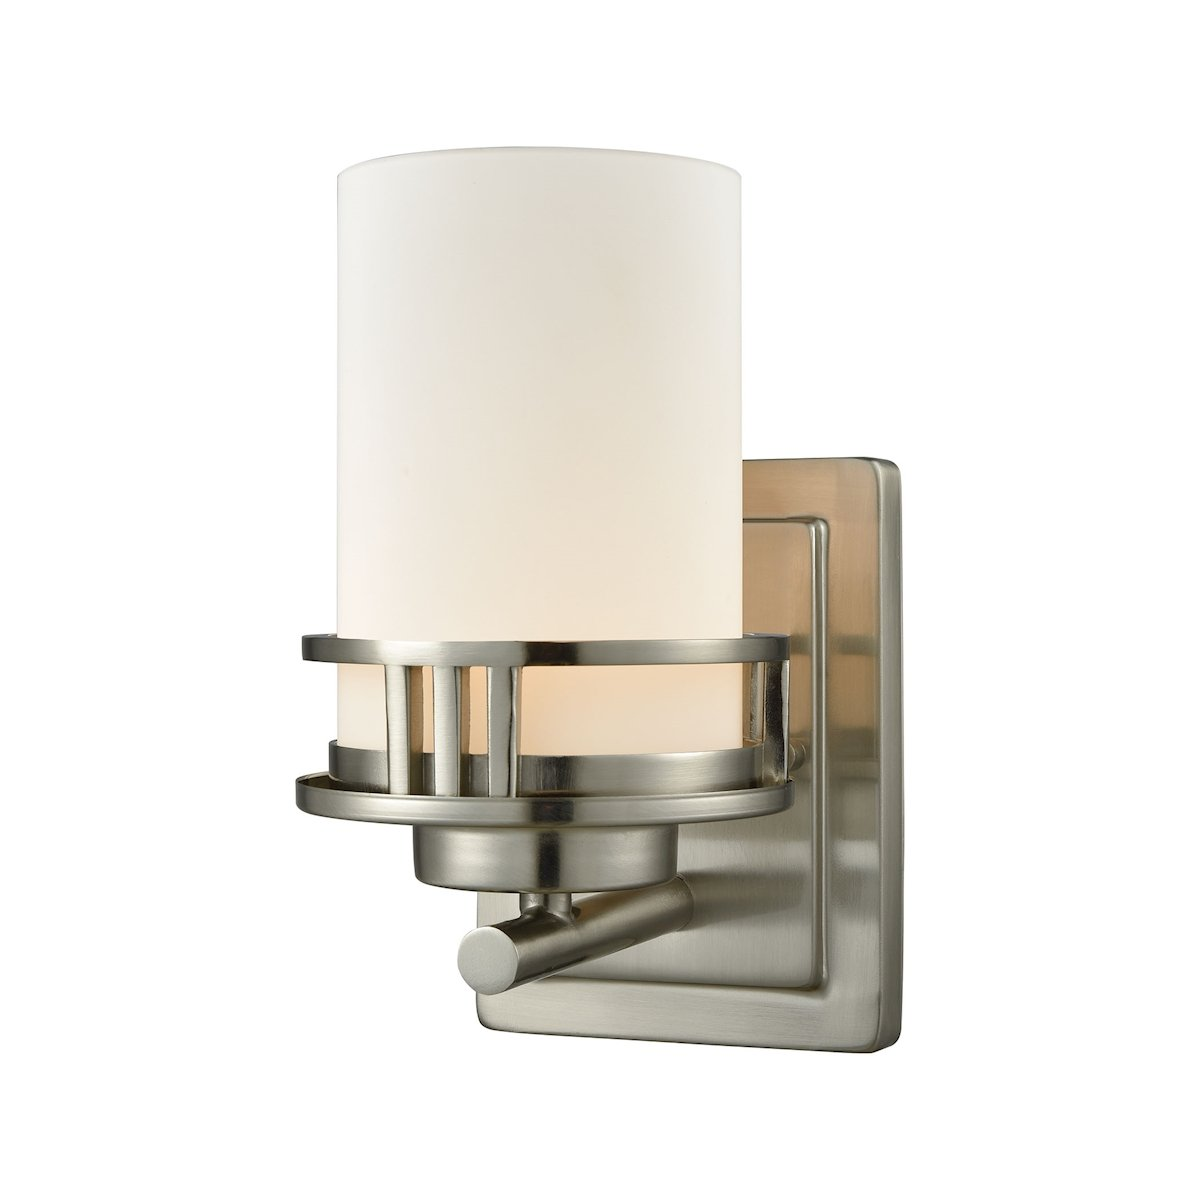 Thomas Lighting CN578172 Ravendale Single Light 5'' Wide Bathroom Sconce with Whi, Brushed Nickel